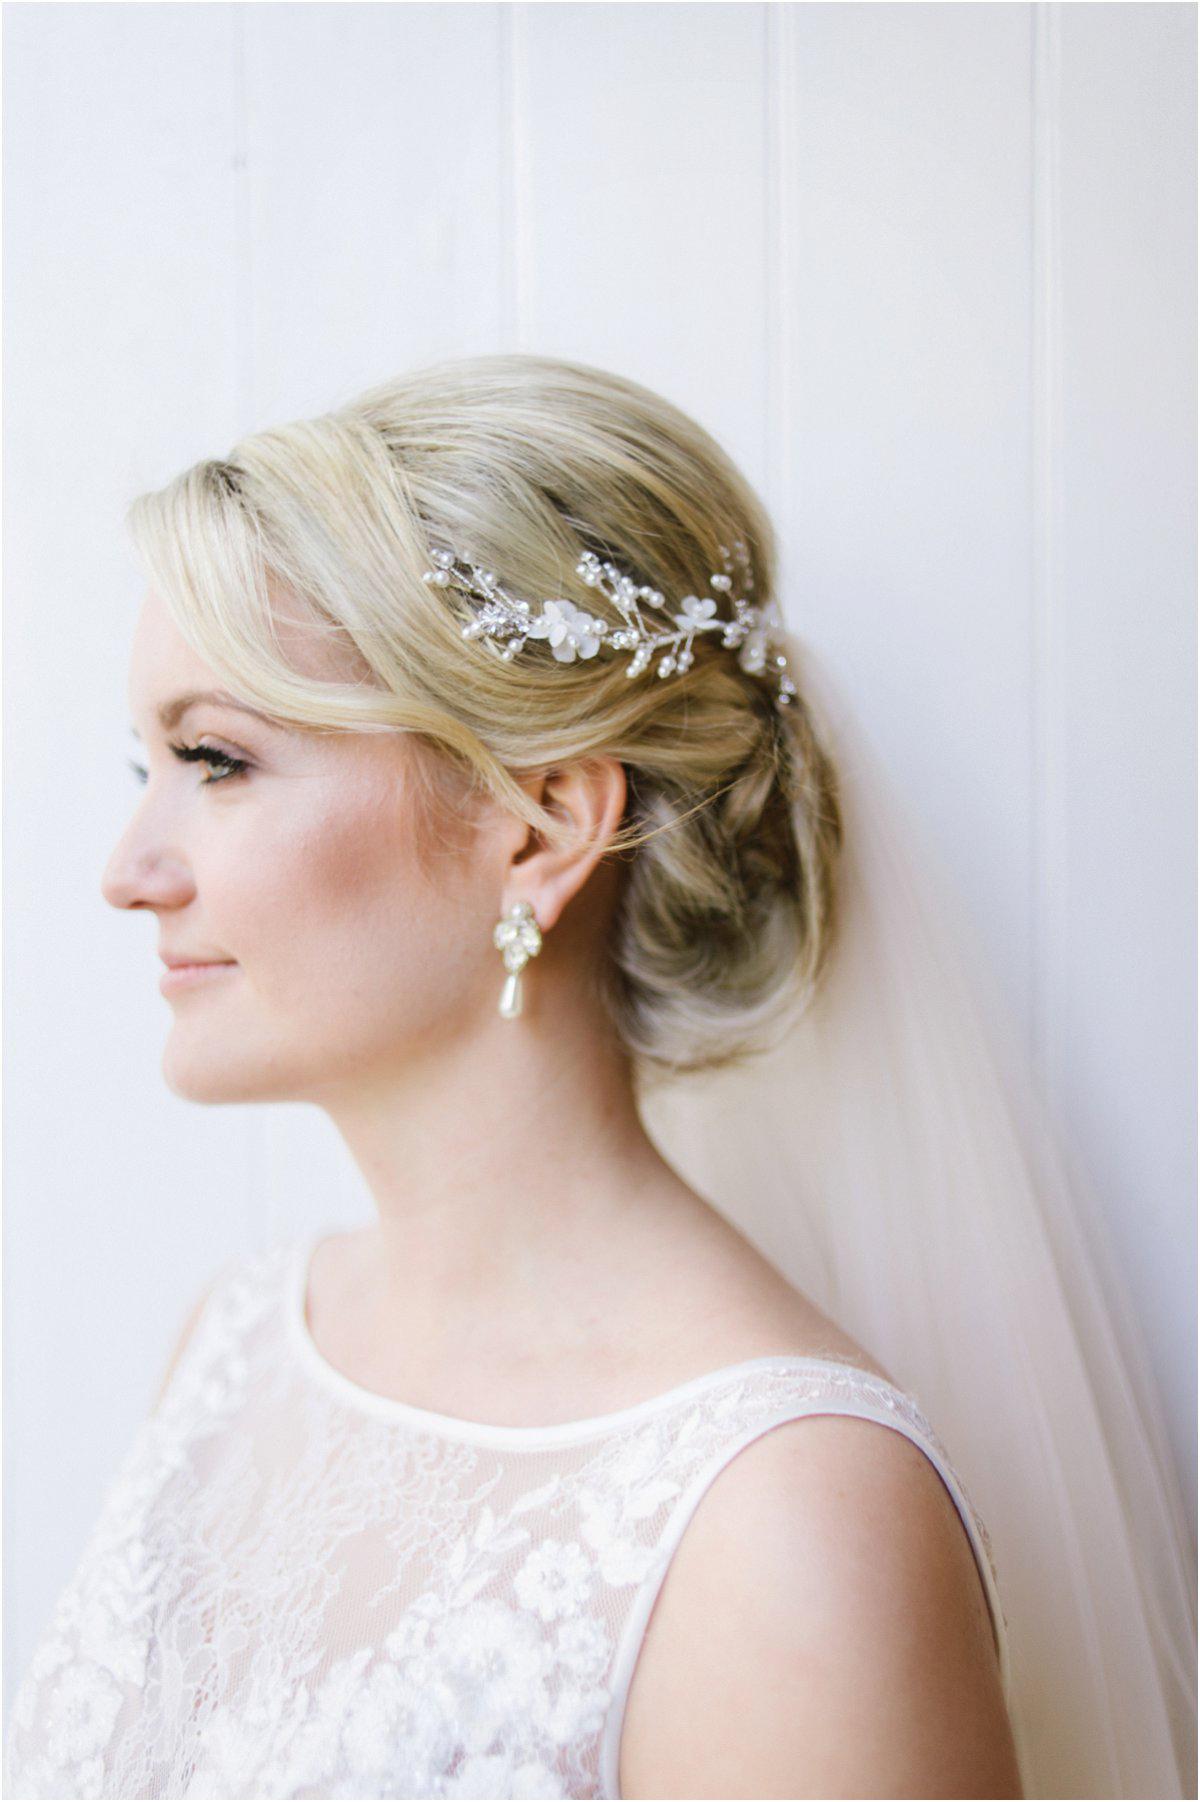 Crofts&Kowalczyk_DundasCastle_WeddingPhotography_Hannah&Tom-65.jpg